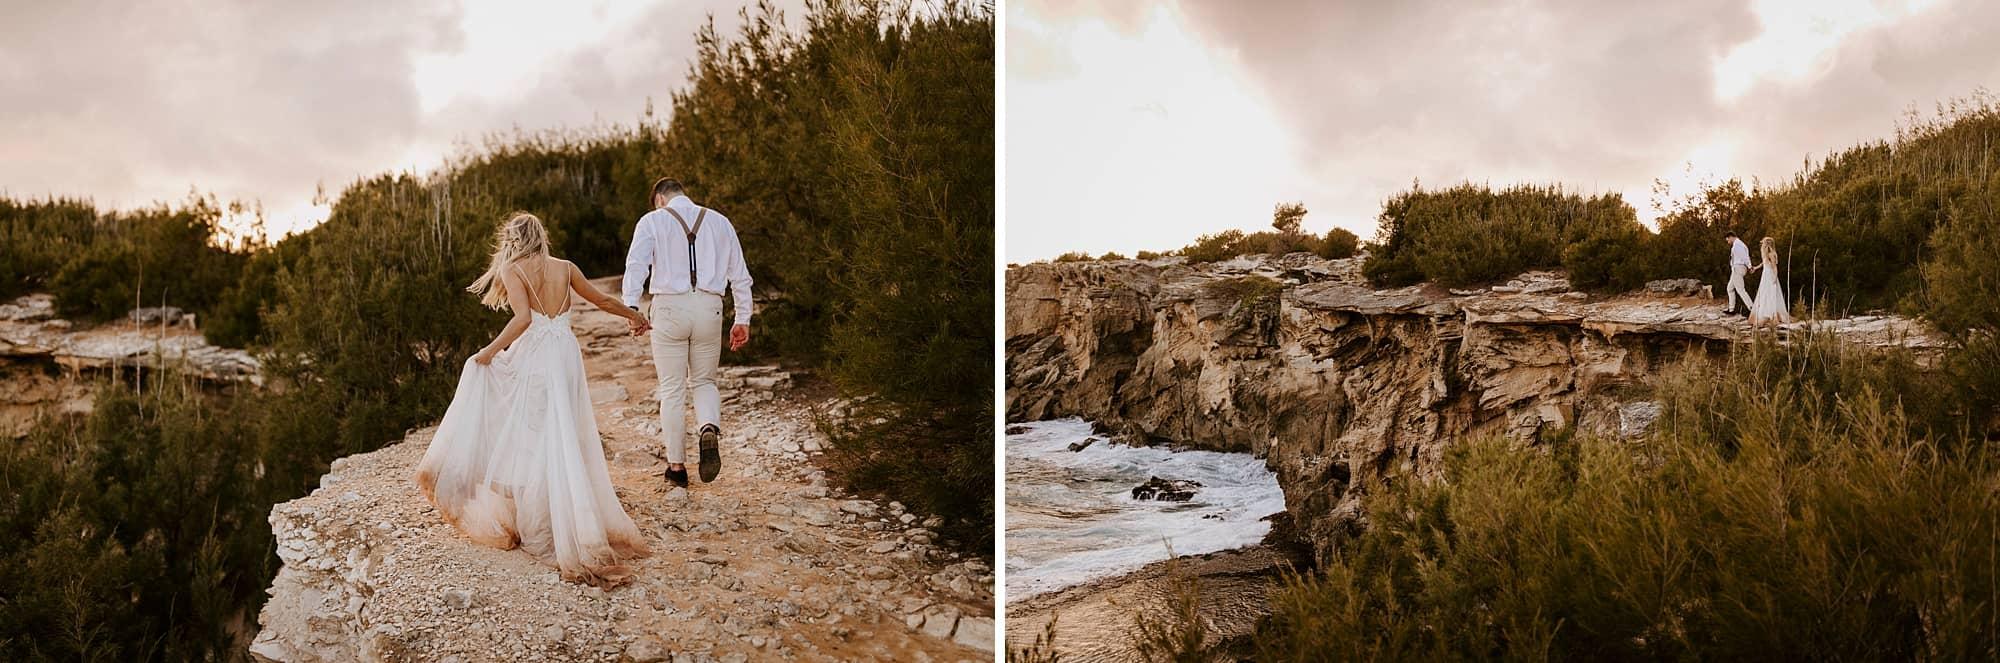 Kauai Hawaii Romantic Intimate Wedding Shipwreck Beach Portraits